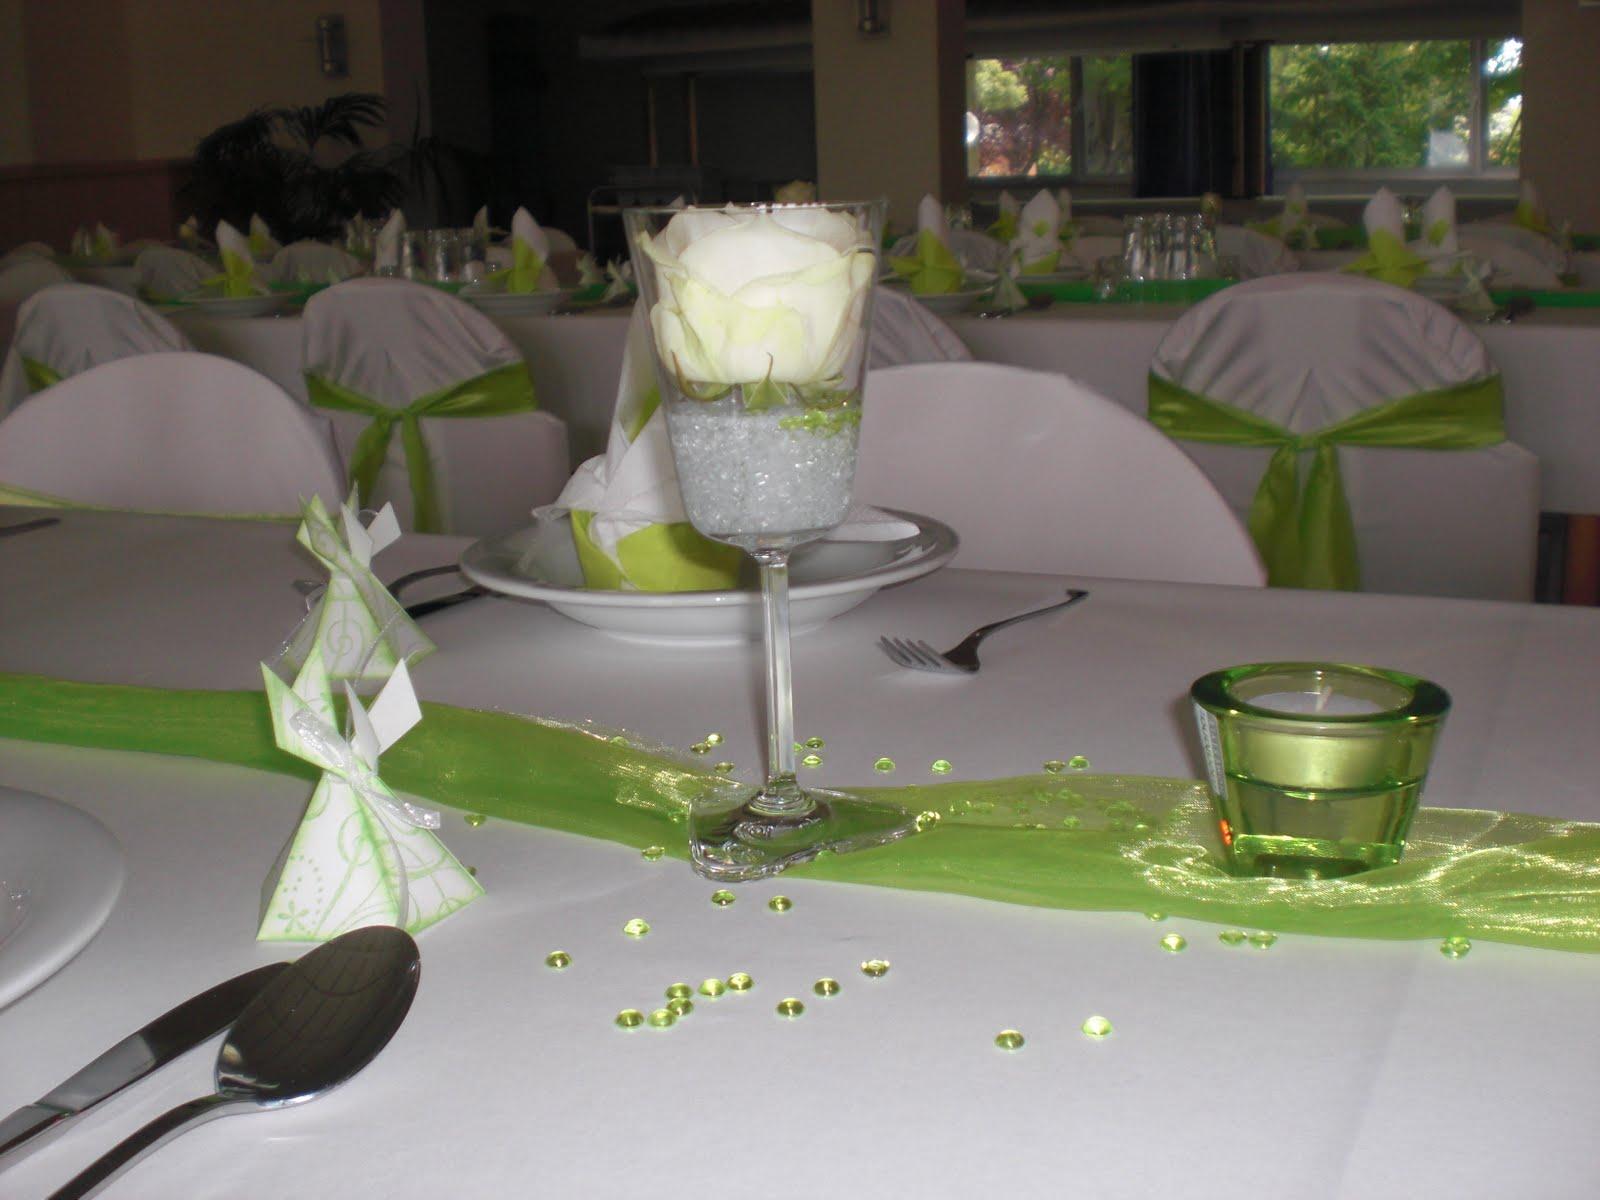 Kathi S Kreative Welt Hochzeitsdekoration